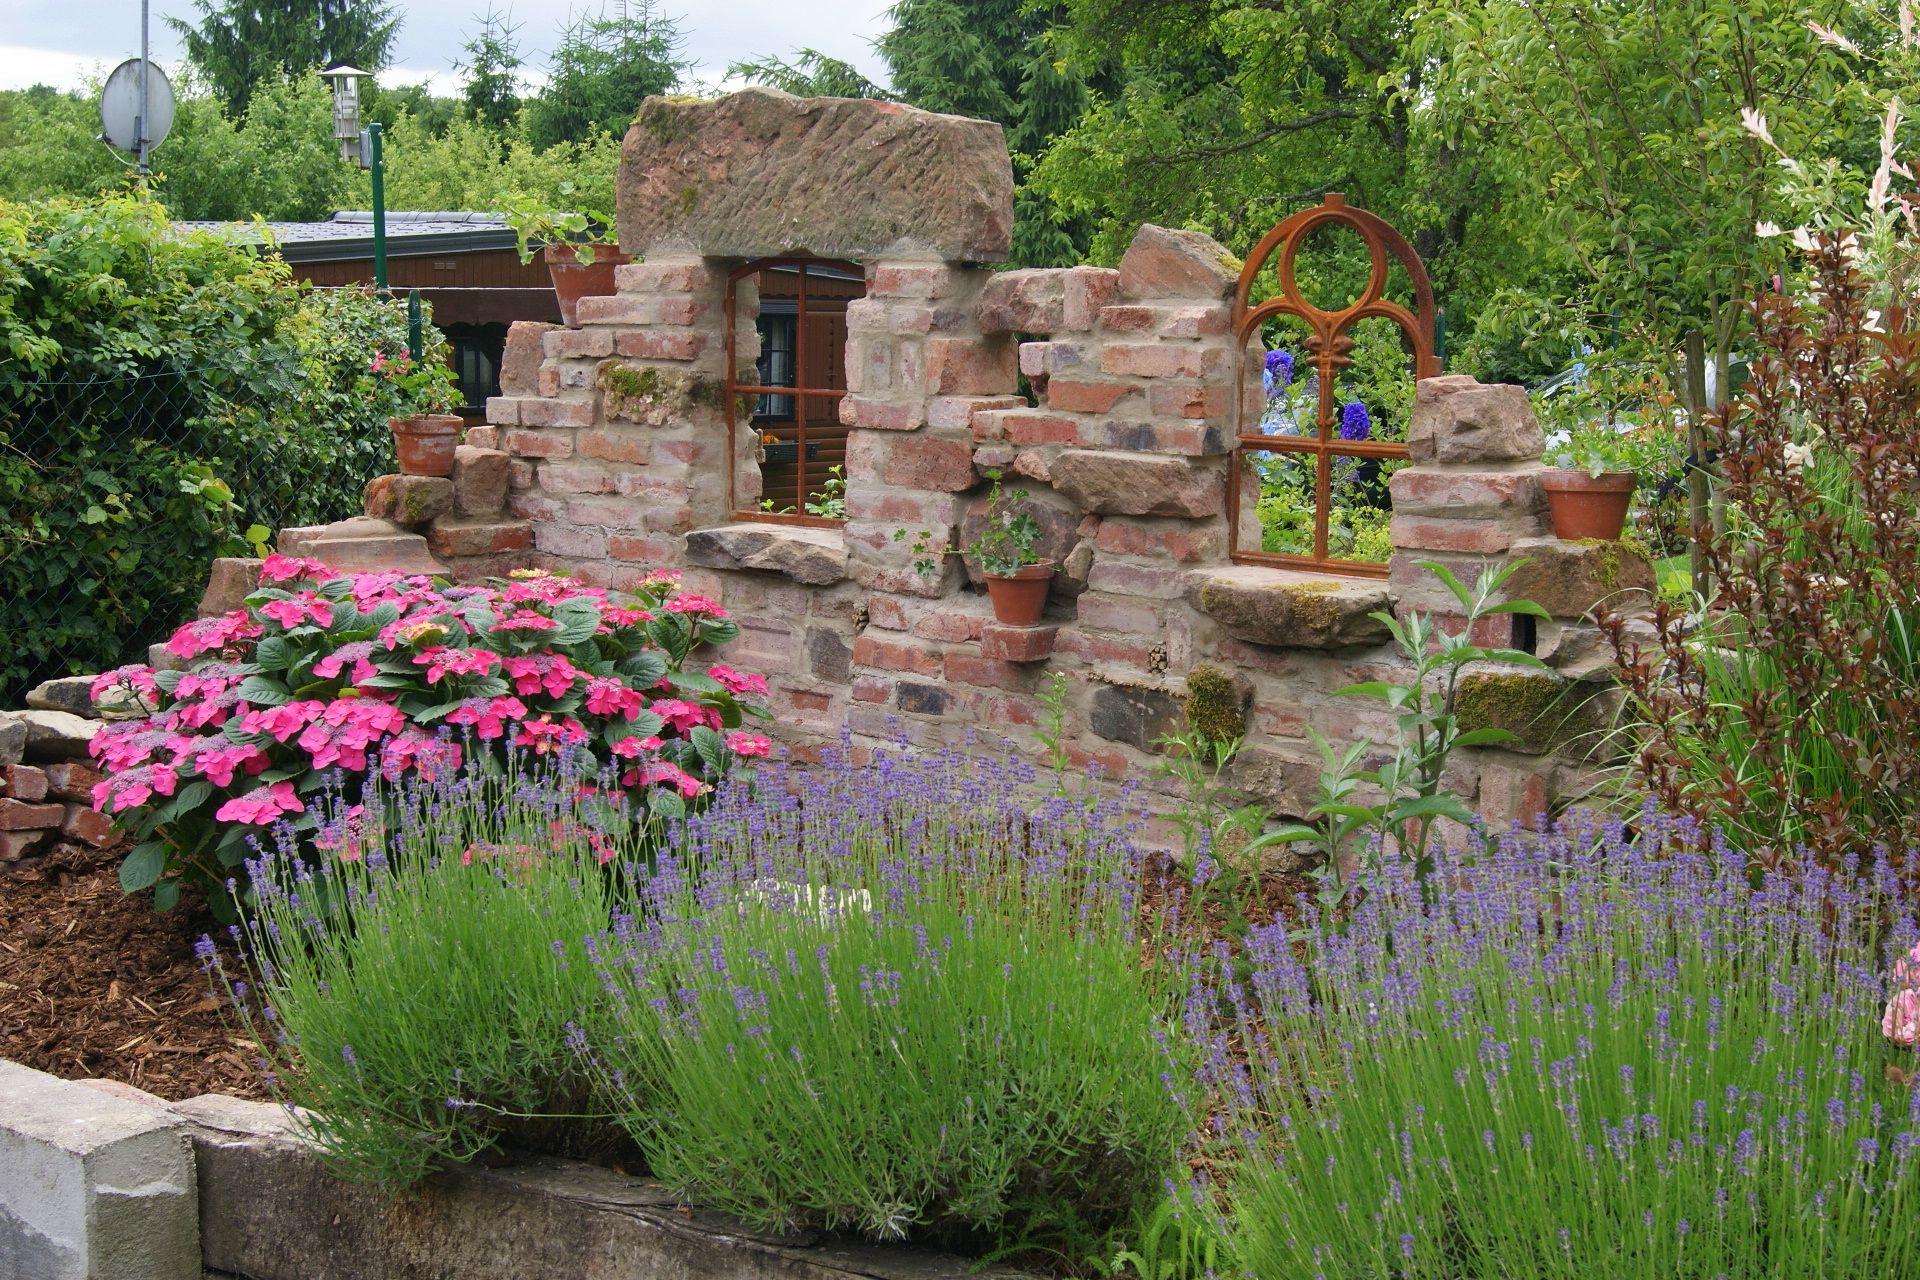 dachziegel recycling GoogleSuche Garten, Steinmauer